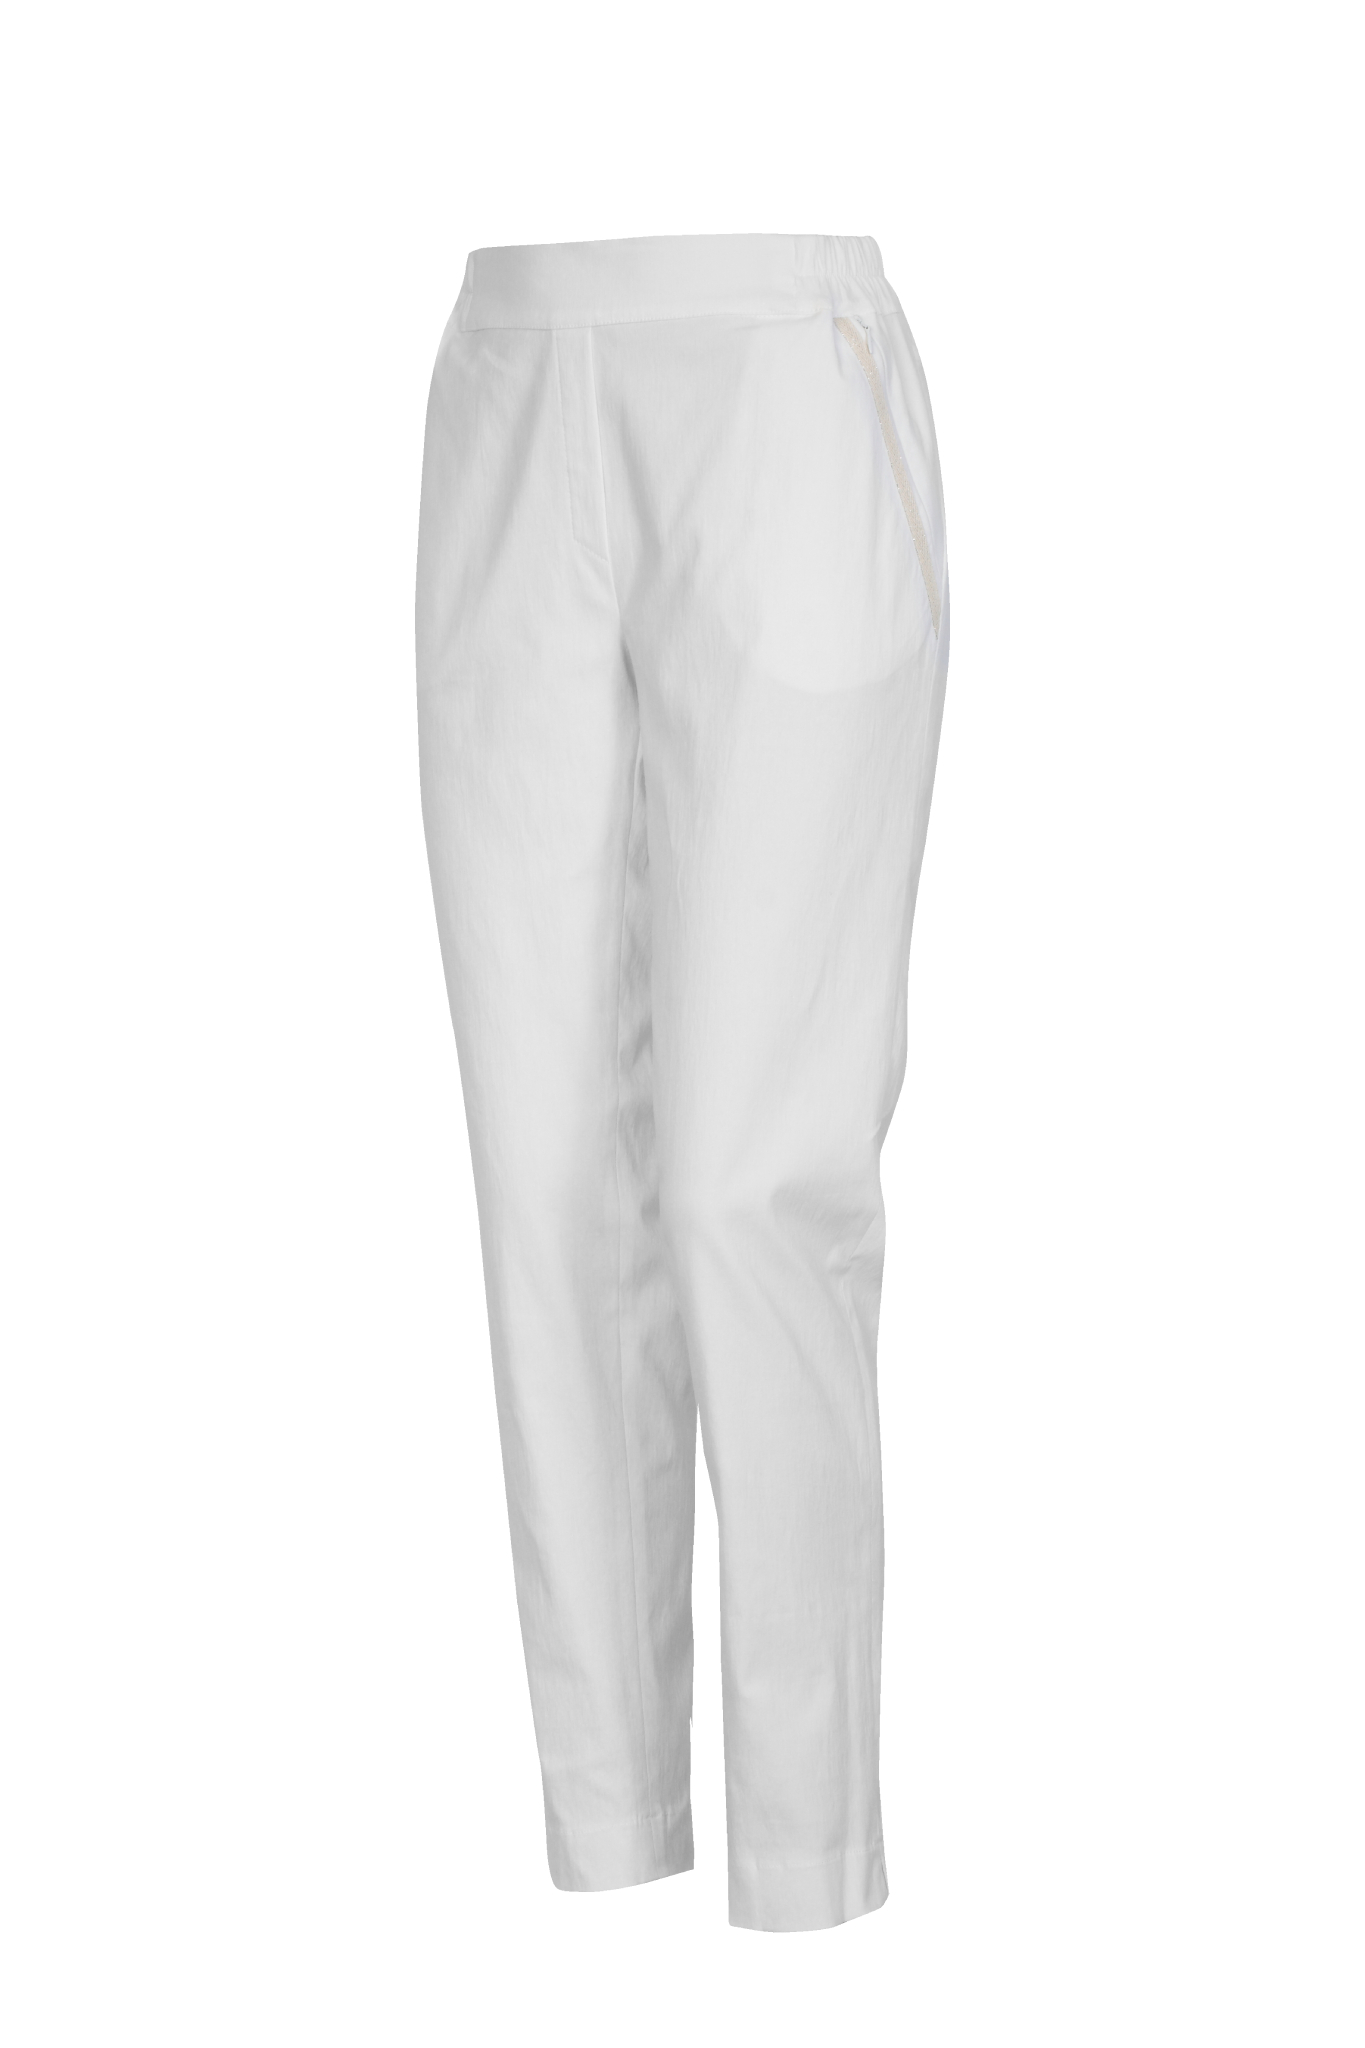 1187 Jumitex biale spodnie na lato